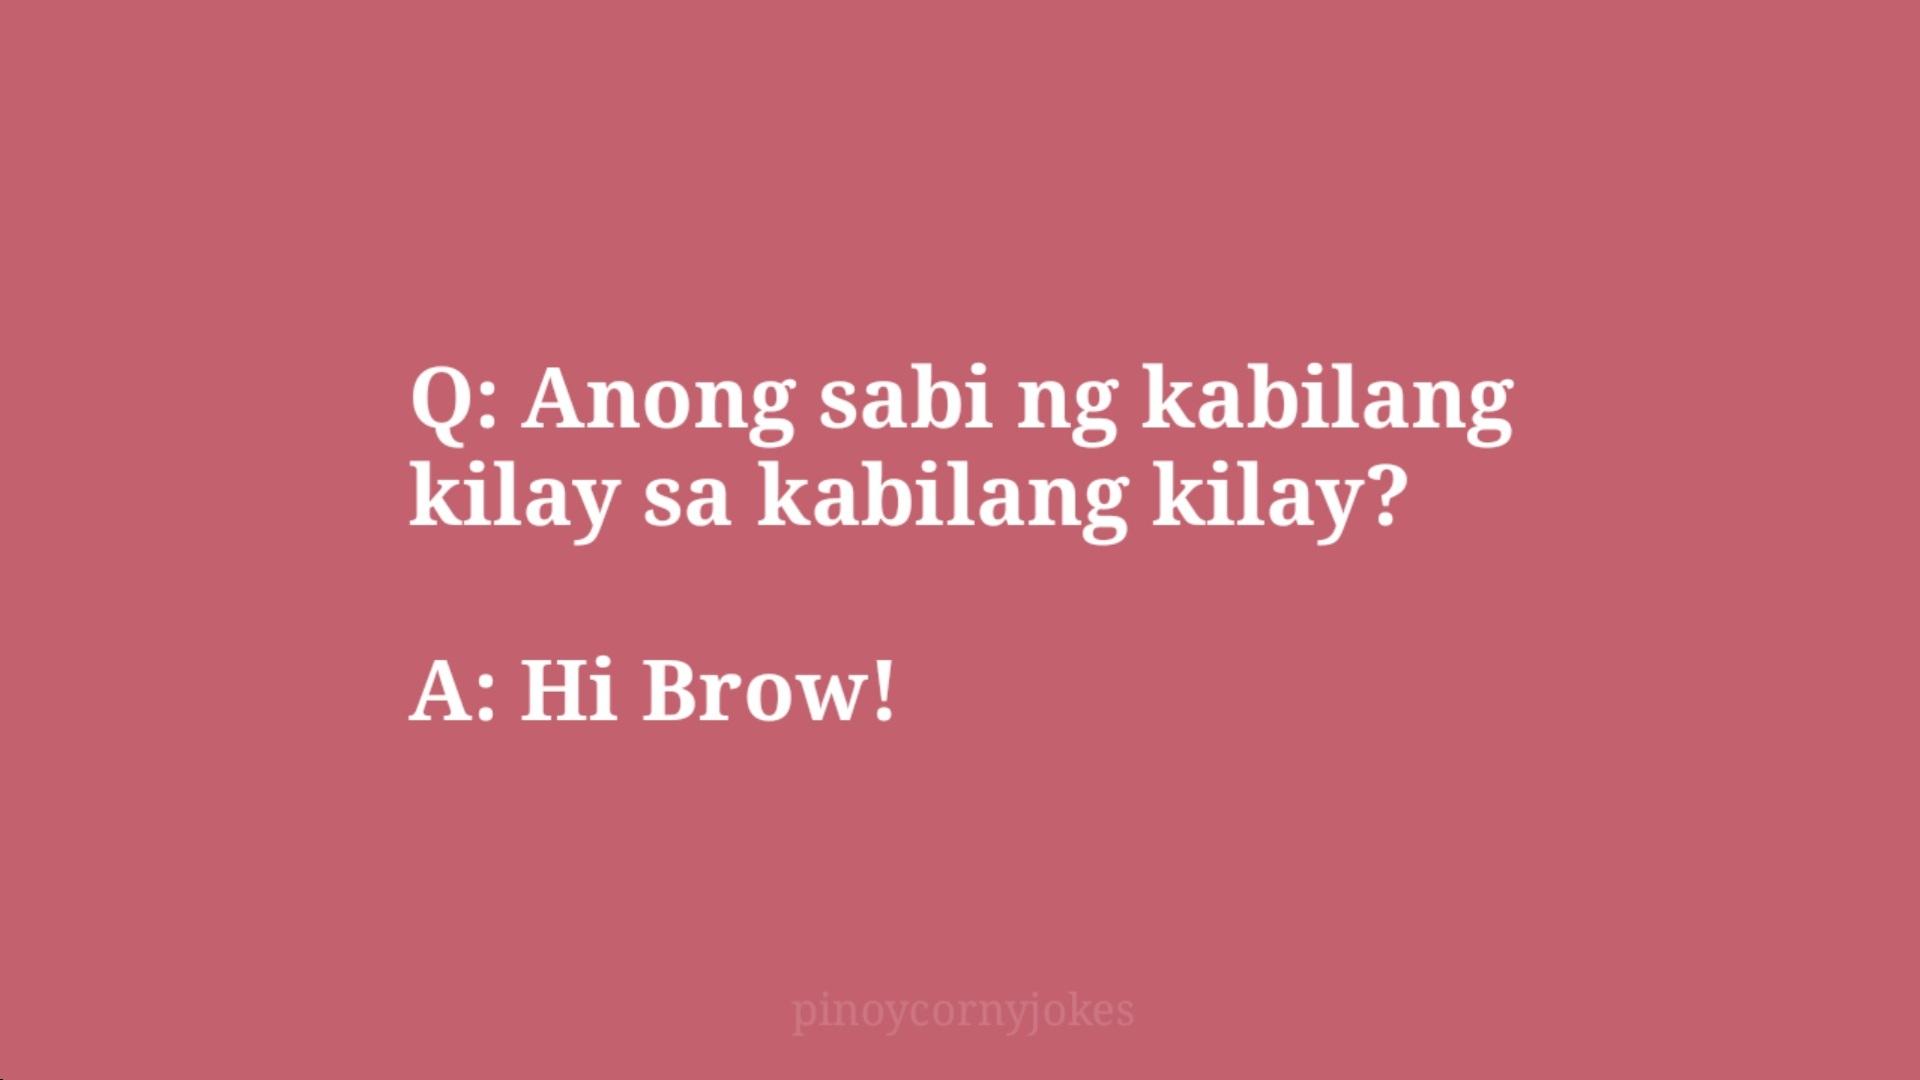 hi brow corny jokes pinoy q and a